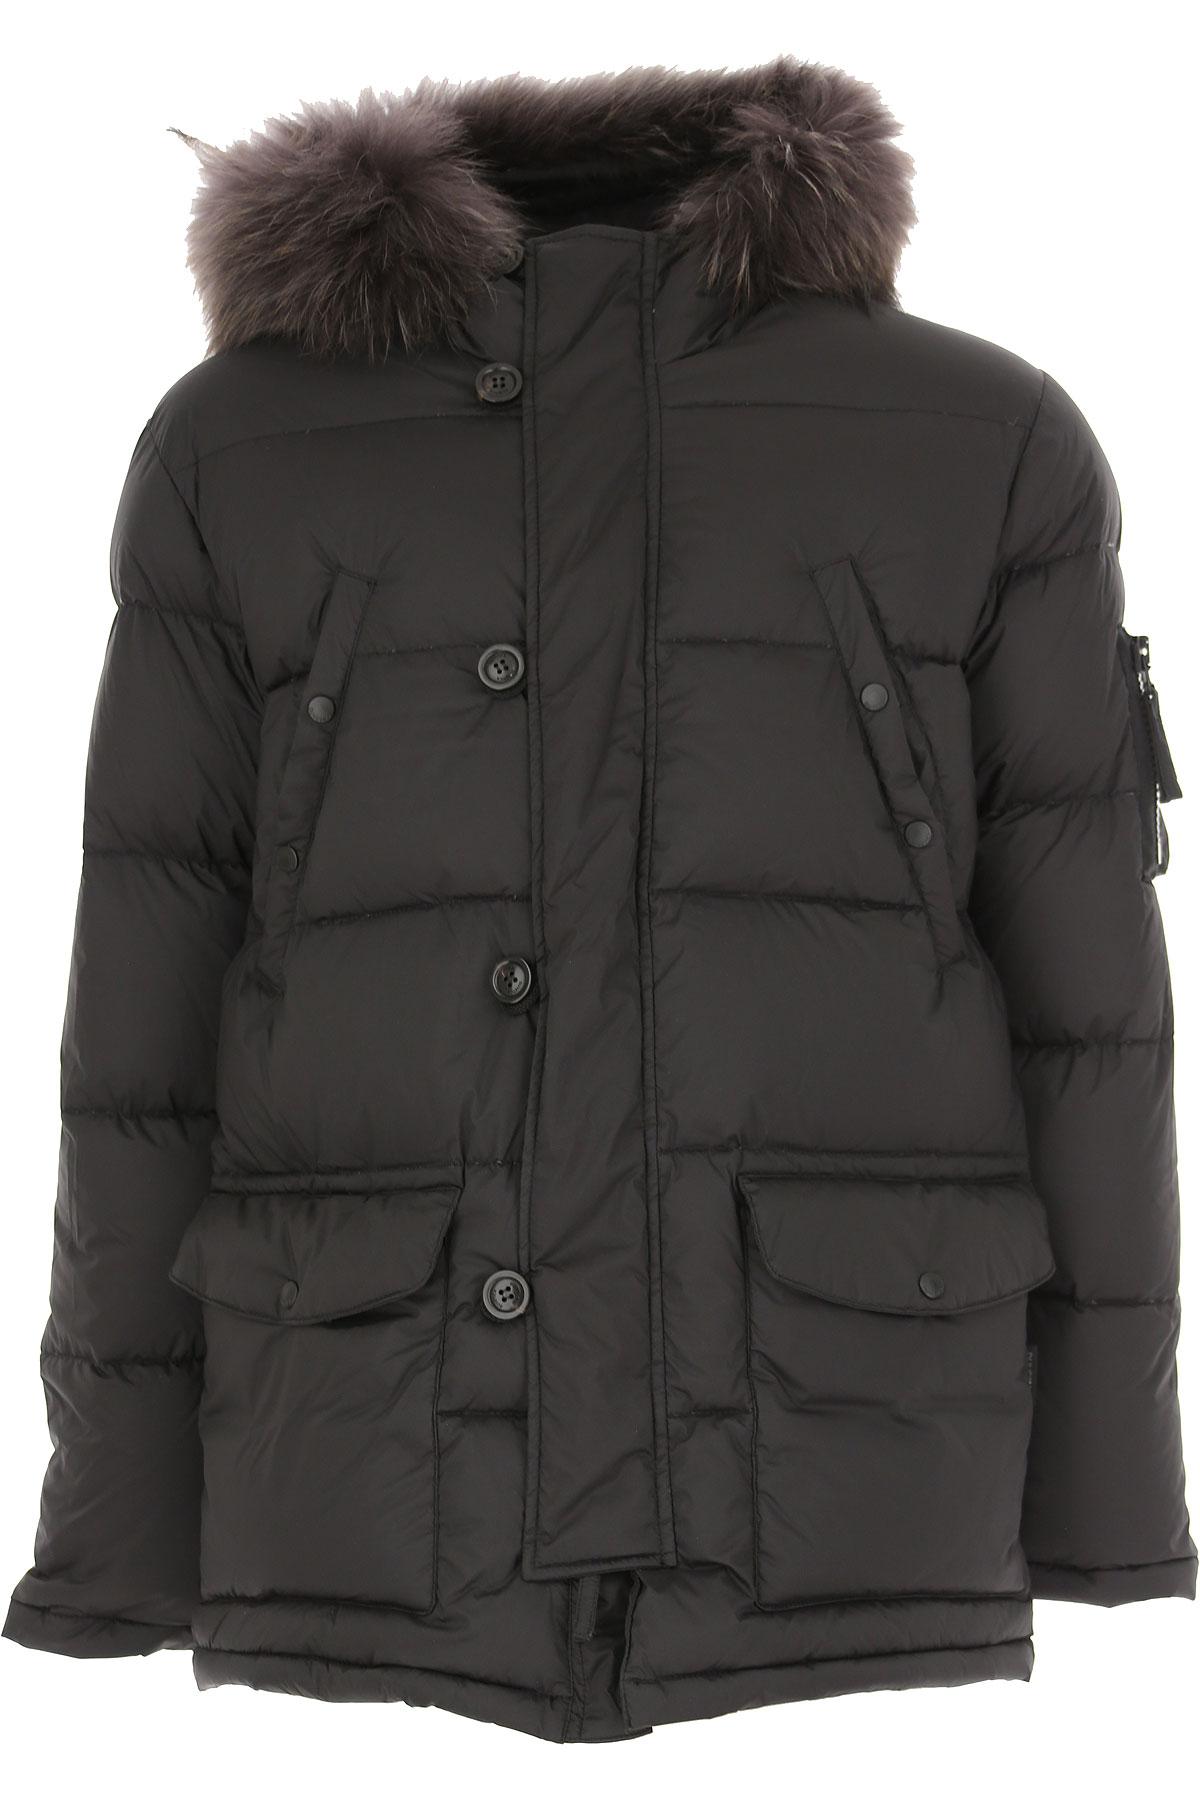 Duvetica Down Jacket for Men, Puffer Ski Jacket On Sale in Outlet, Black, polyamide, 2019, S XL